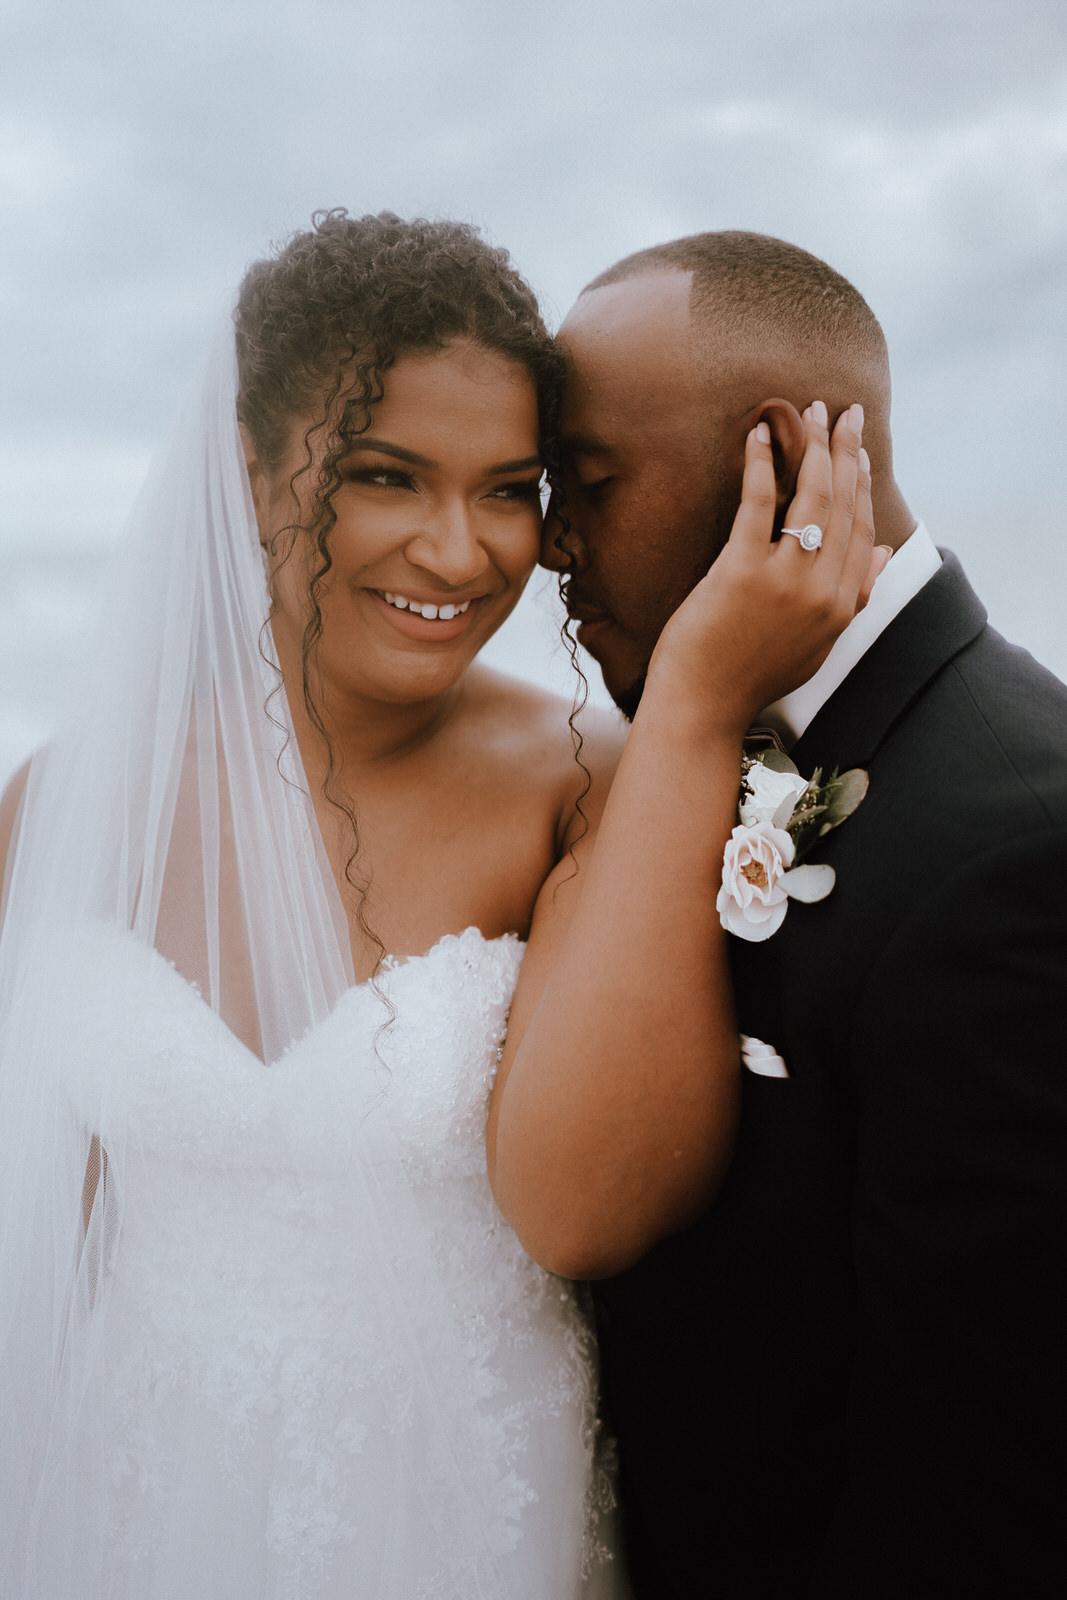 South Seas Island Resort Elopement- Alyana and Shawn- Michelle Gonzalez Photography-257.JPG